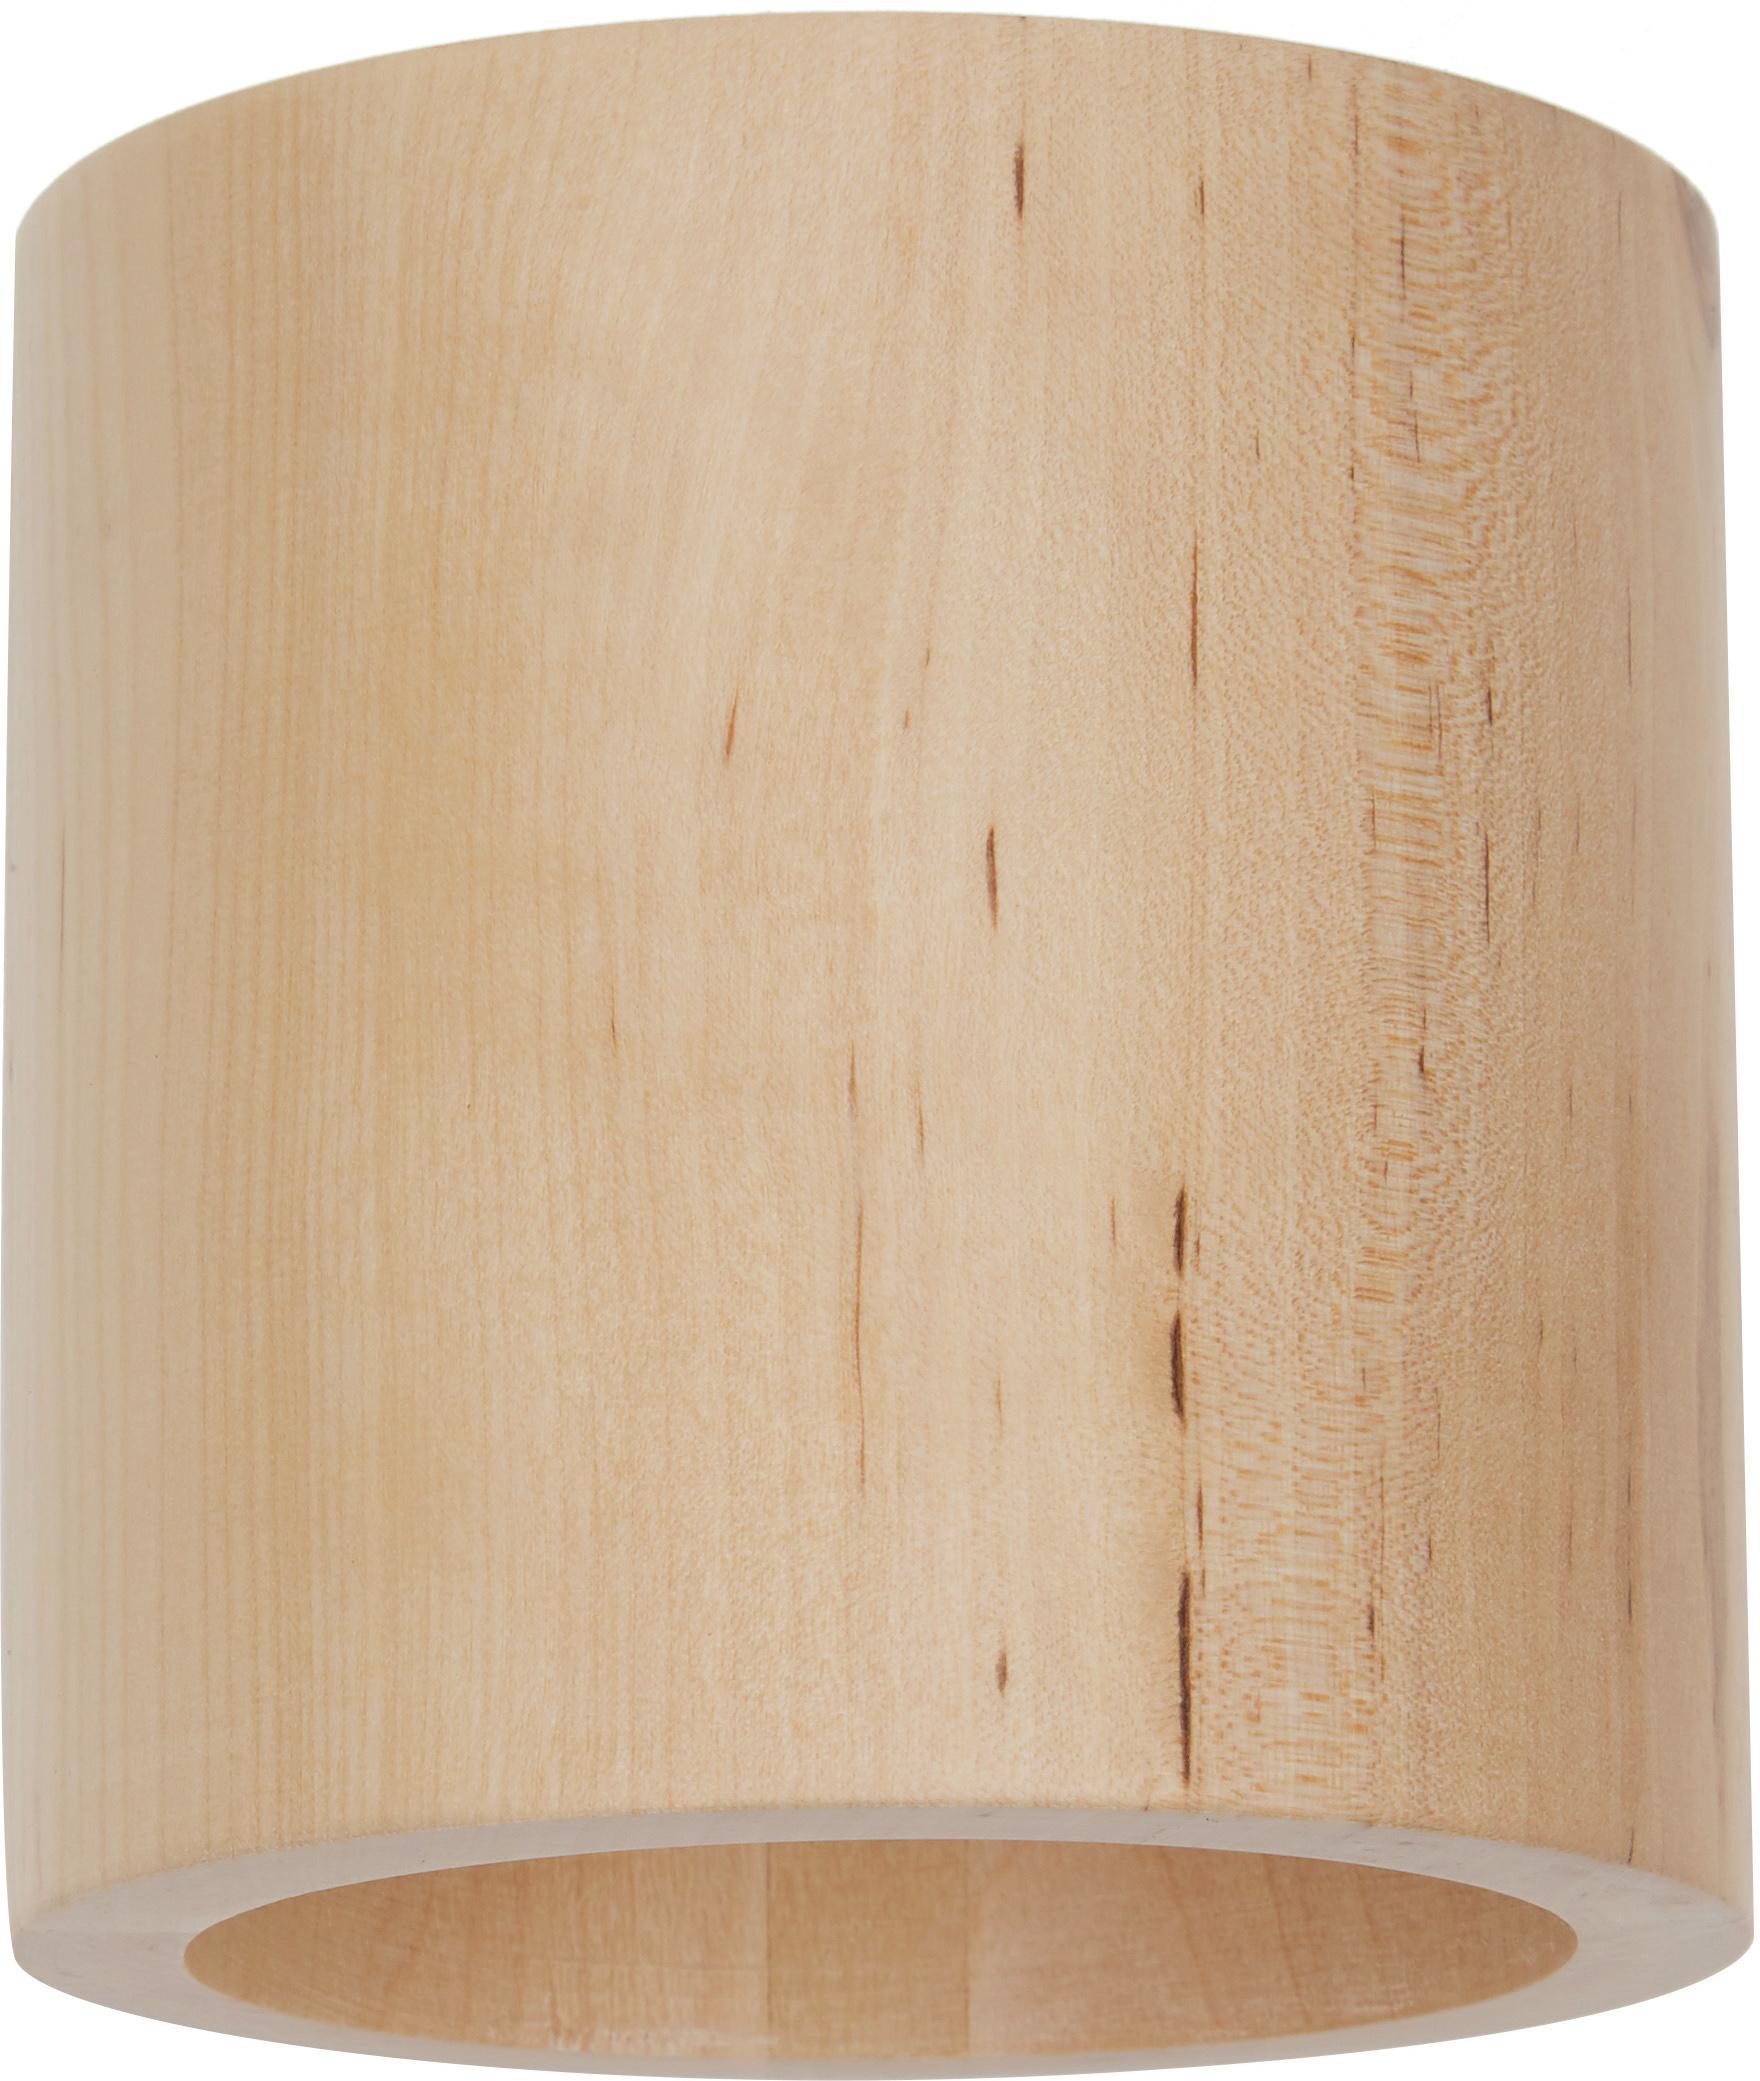 Wandlamp Roda van hout, Hout, Lichtbruin, 10 x 10 cm